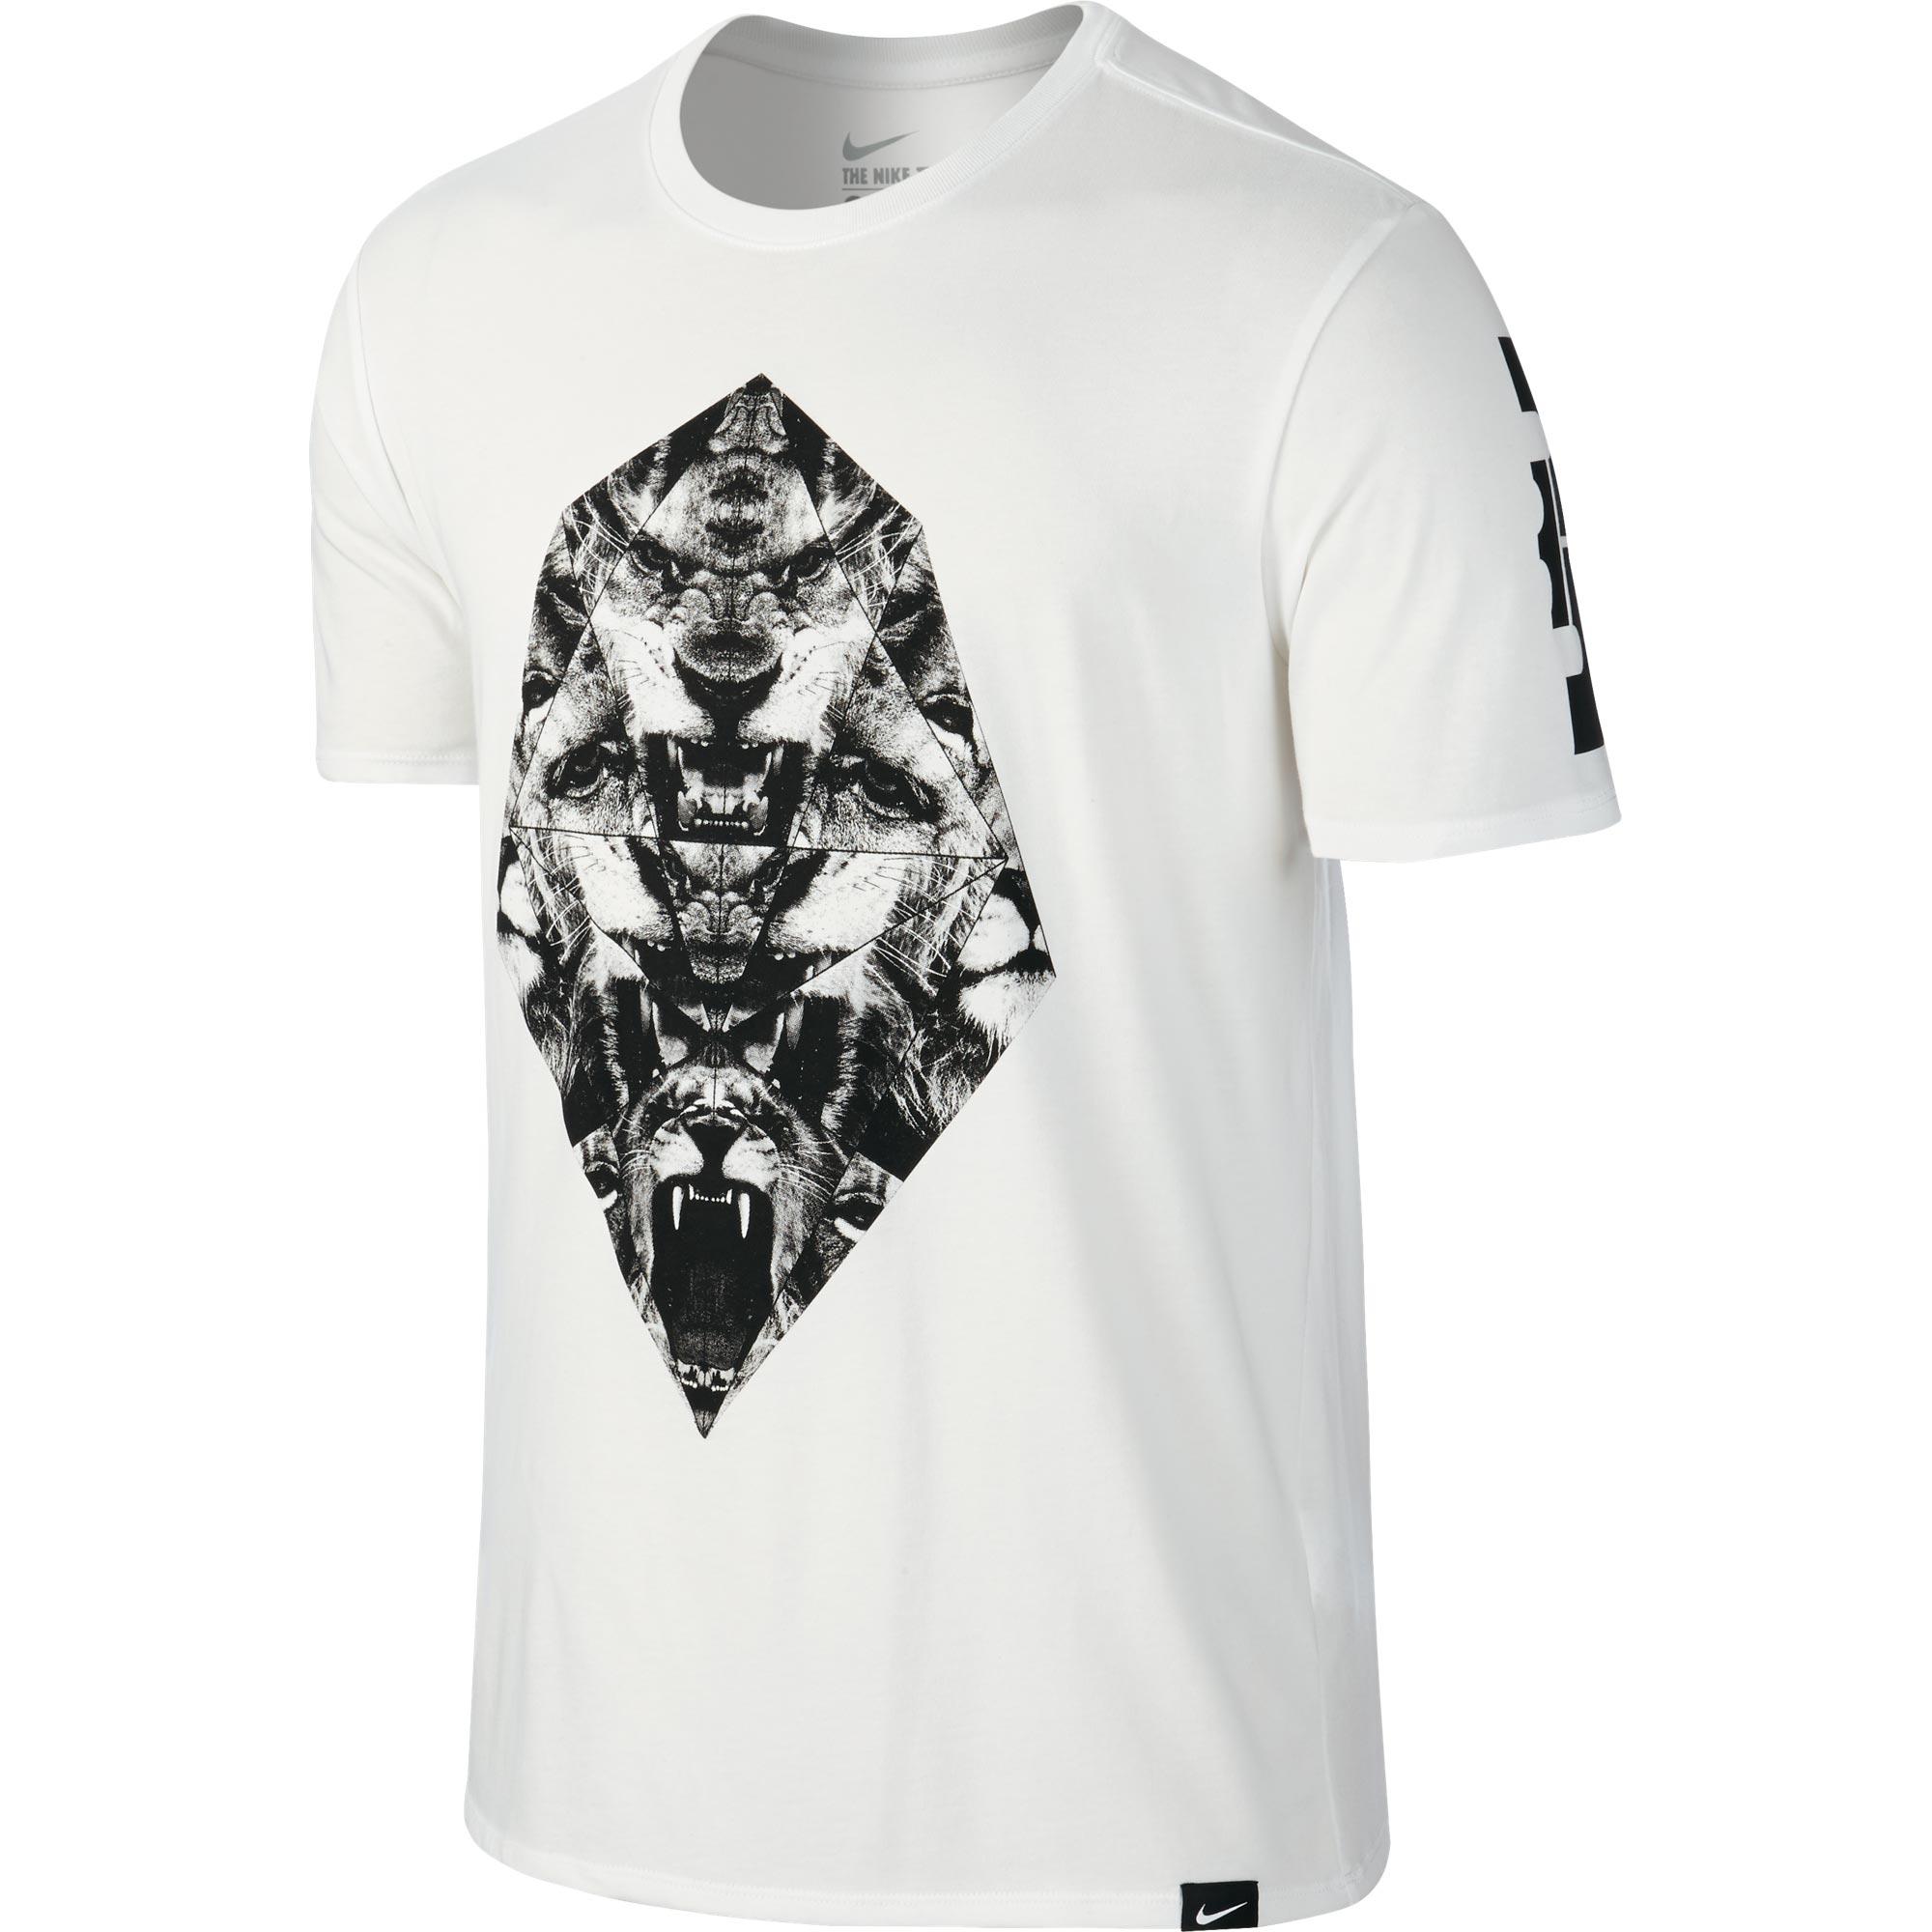 Nike LeBron Art 2 T-Shirt - White